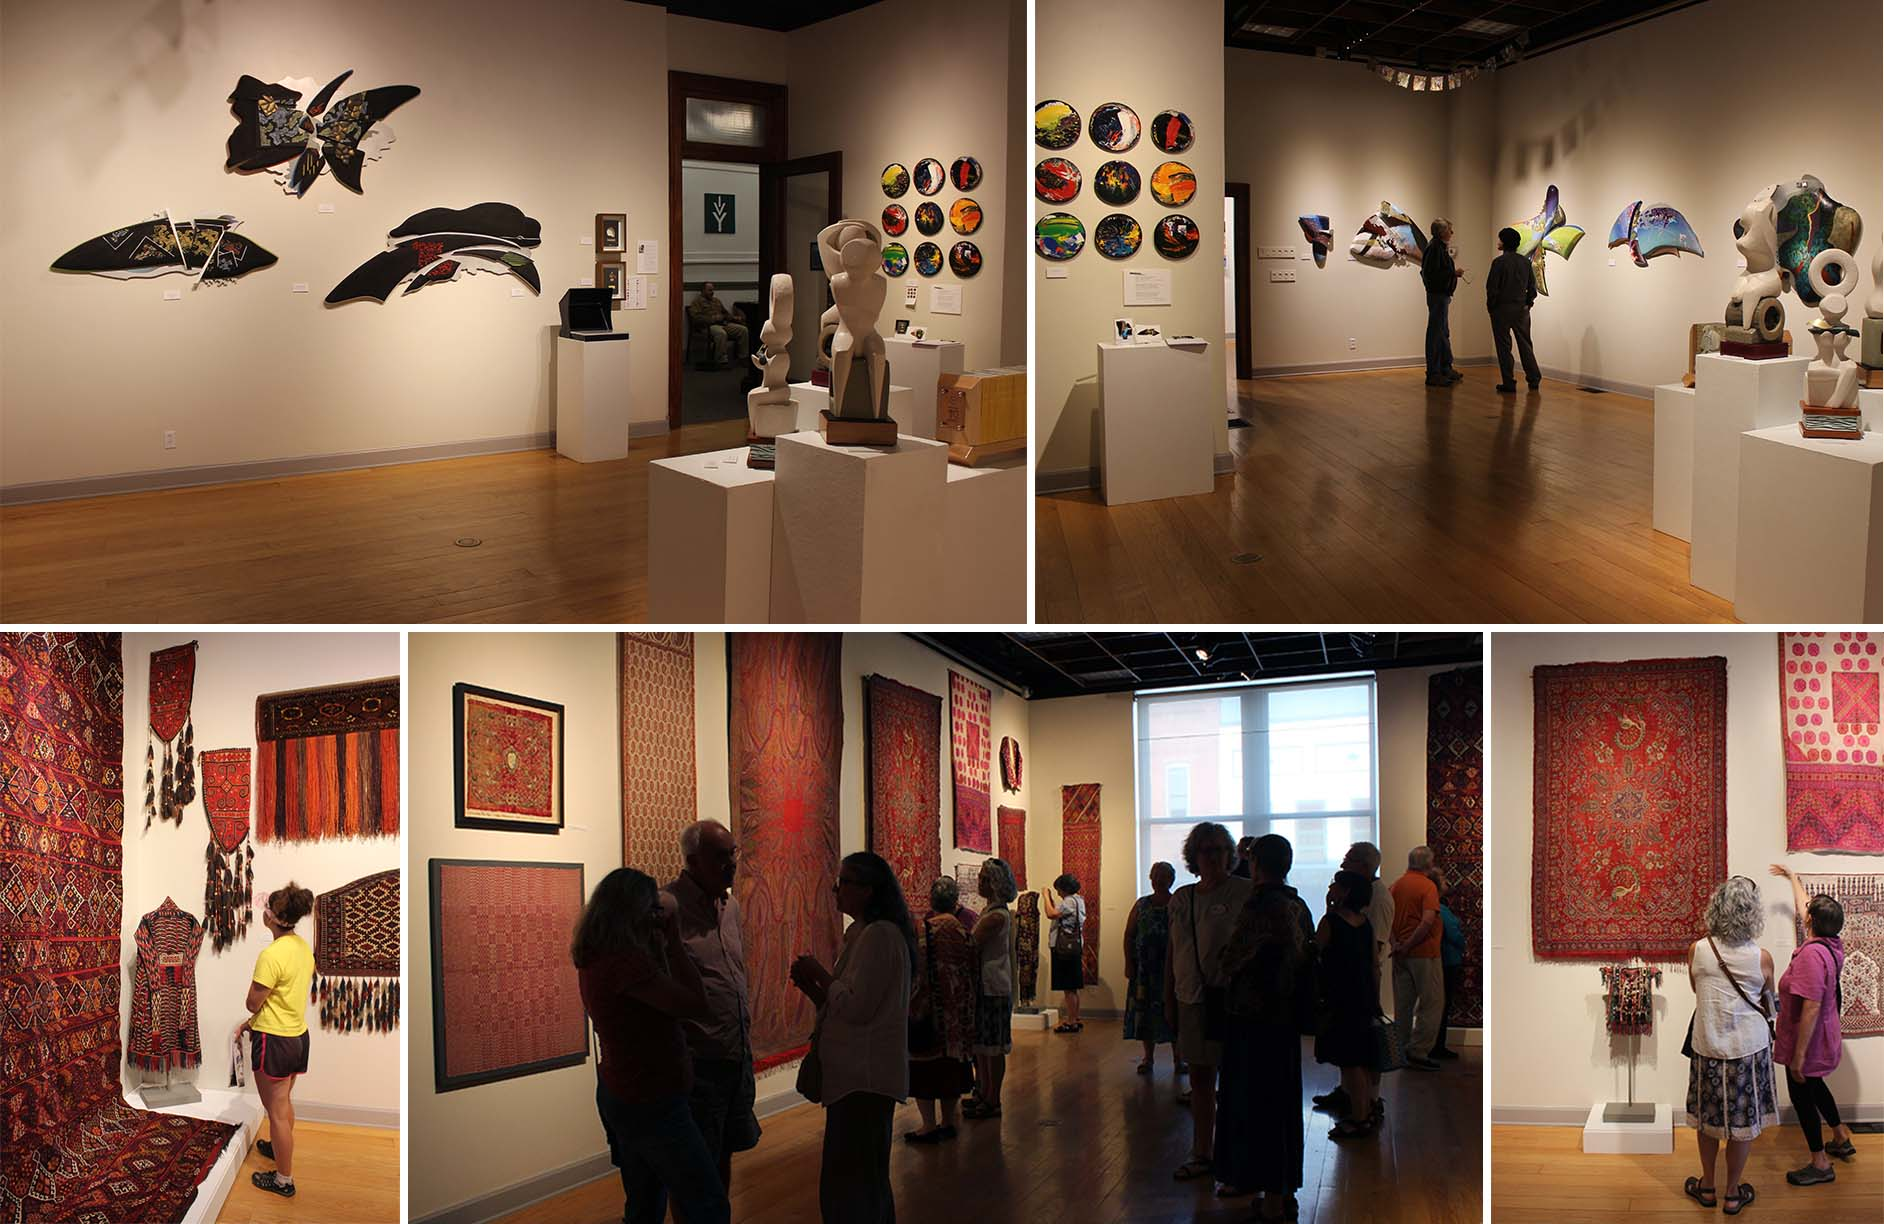 John Waldron Arts Center